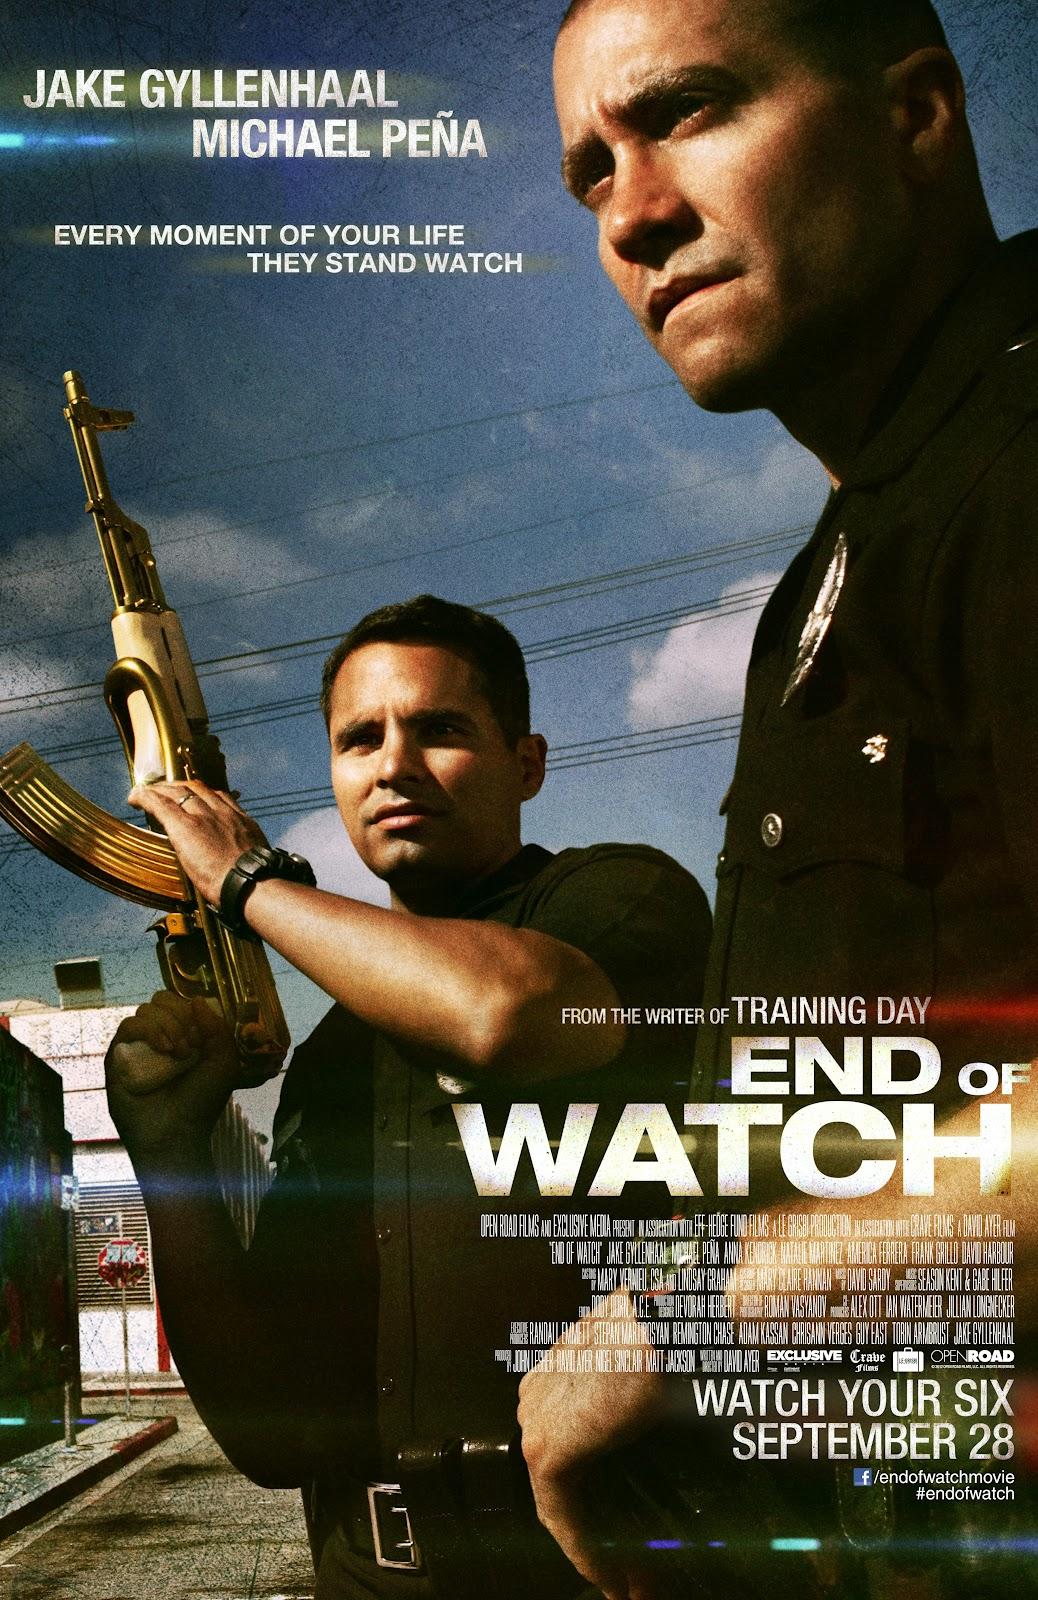 http://3.bp.blogspot.com/-TBkm4pPLU6I/T9uuQJPEqlI/AAAAAAAANJA/Vz4W7b3oH3E/s1600/end-of-watch-poster.jpg